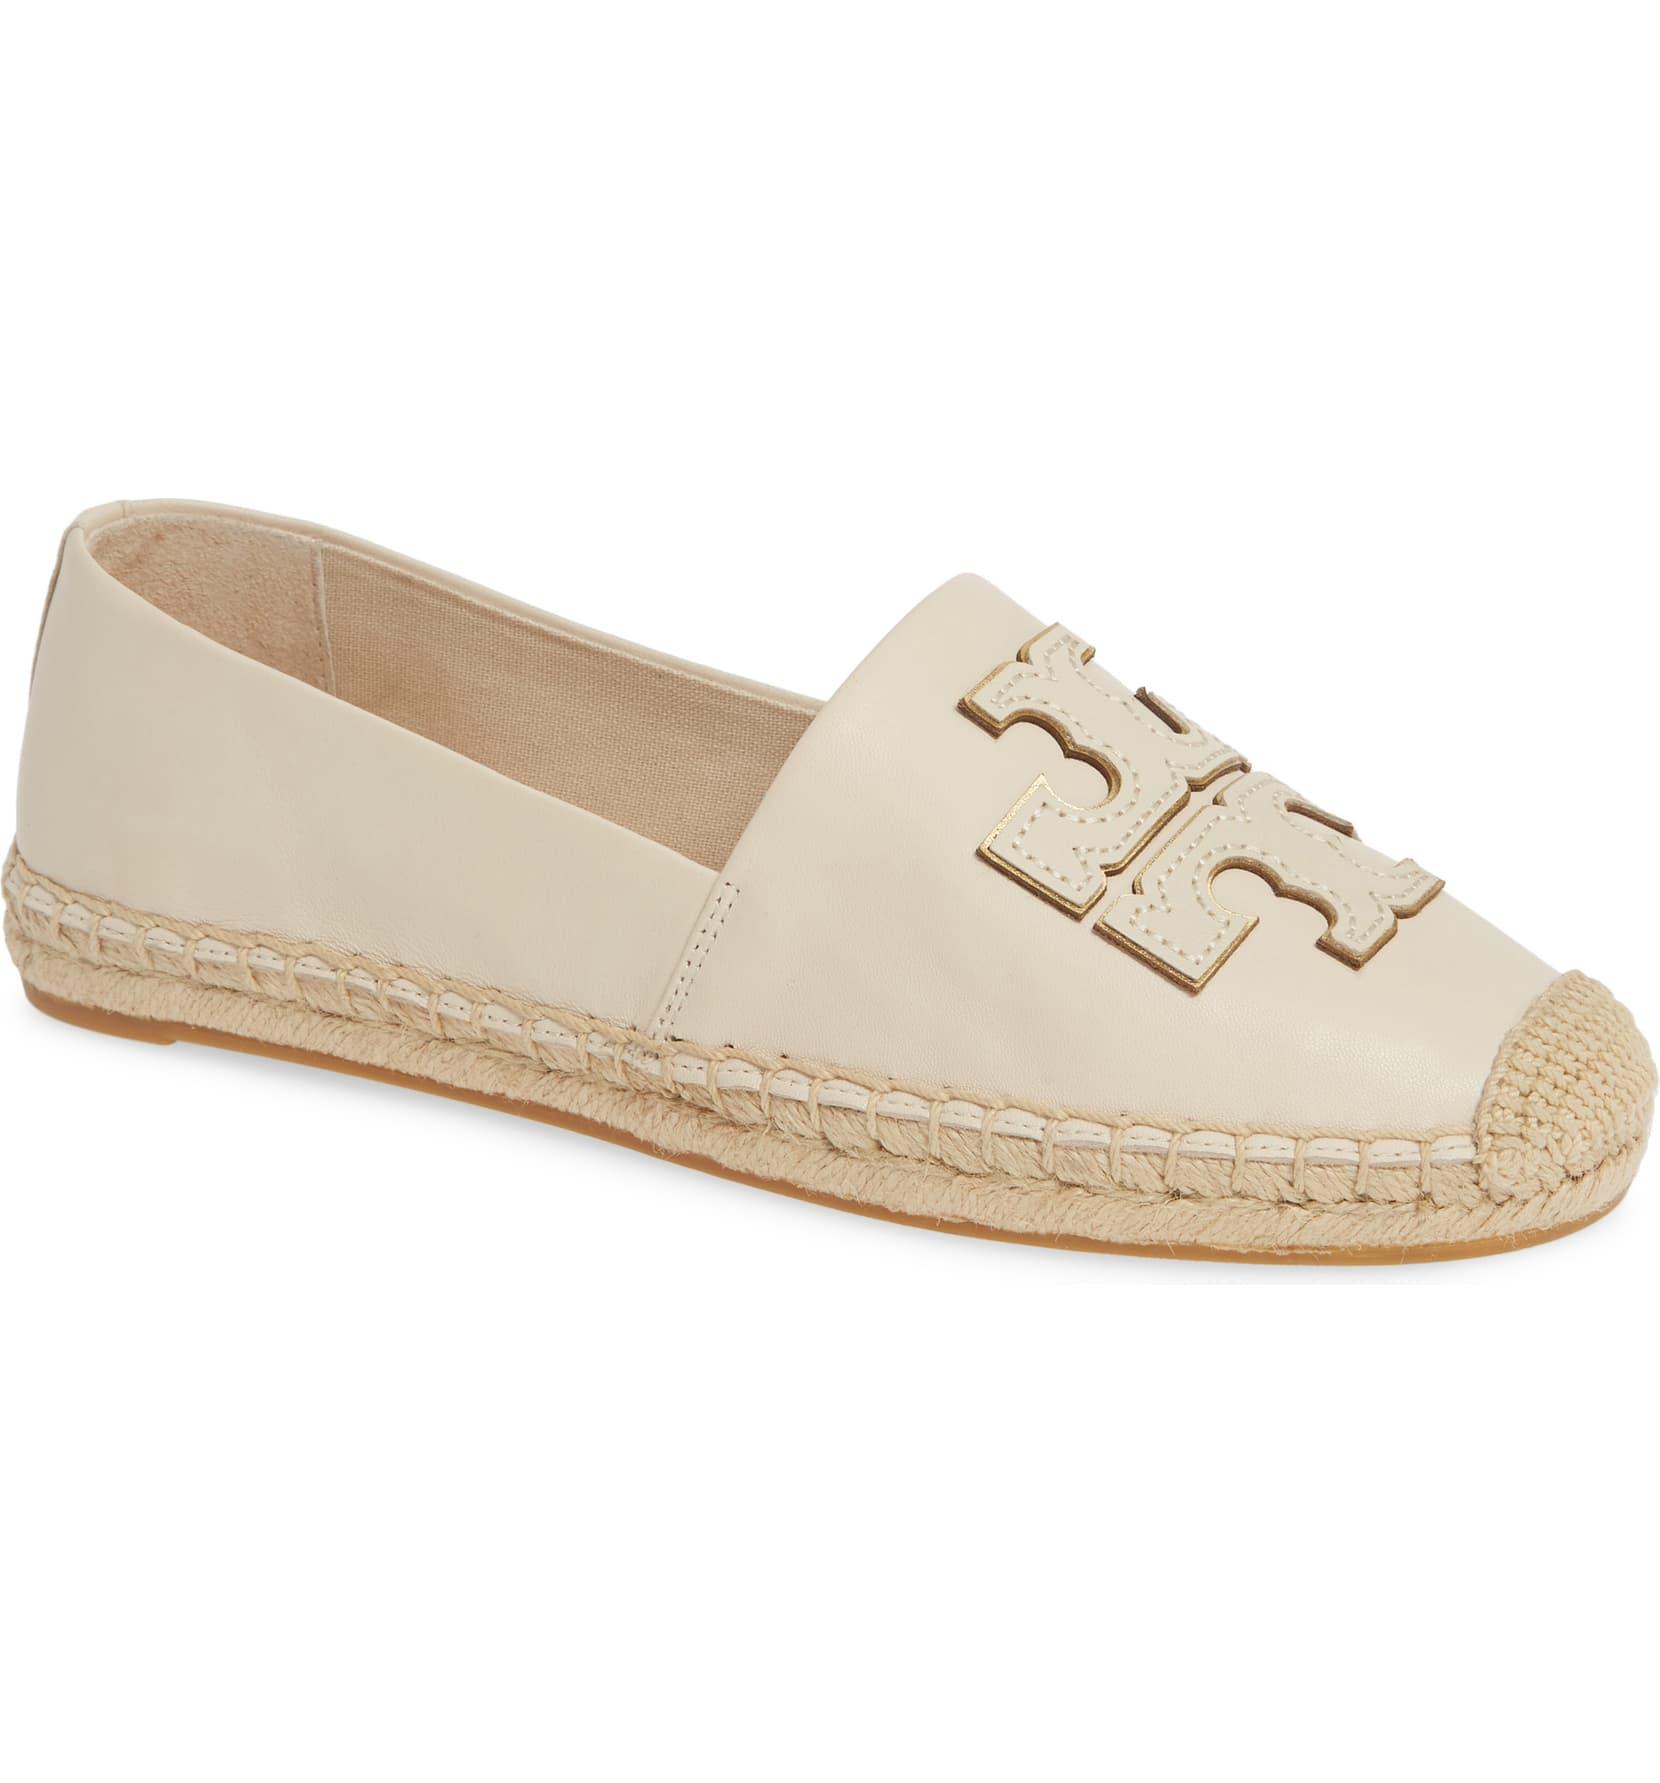 Cream Gold Flats Shoes